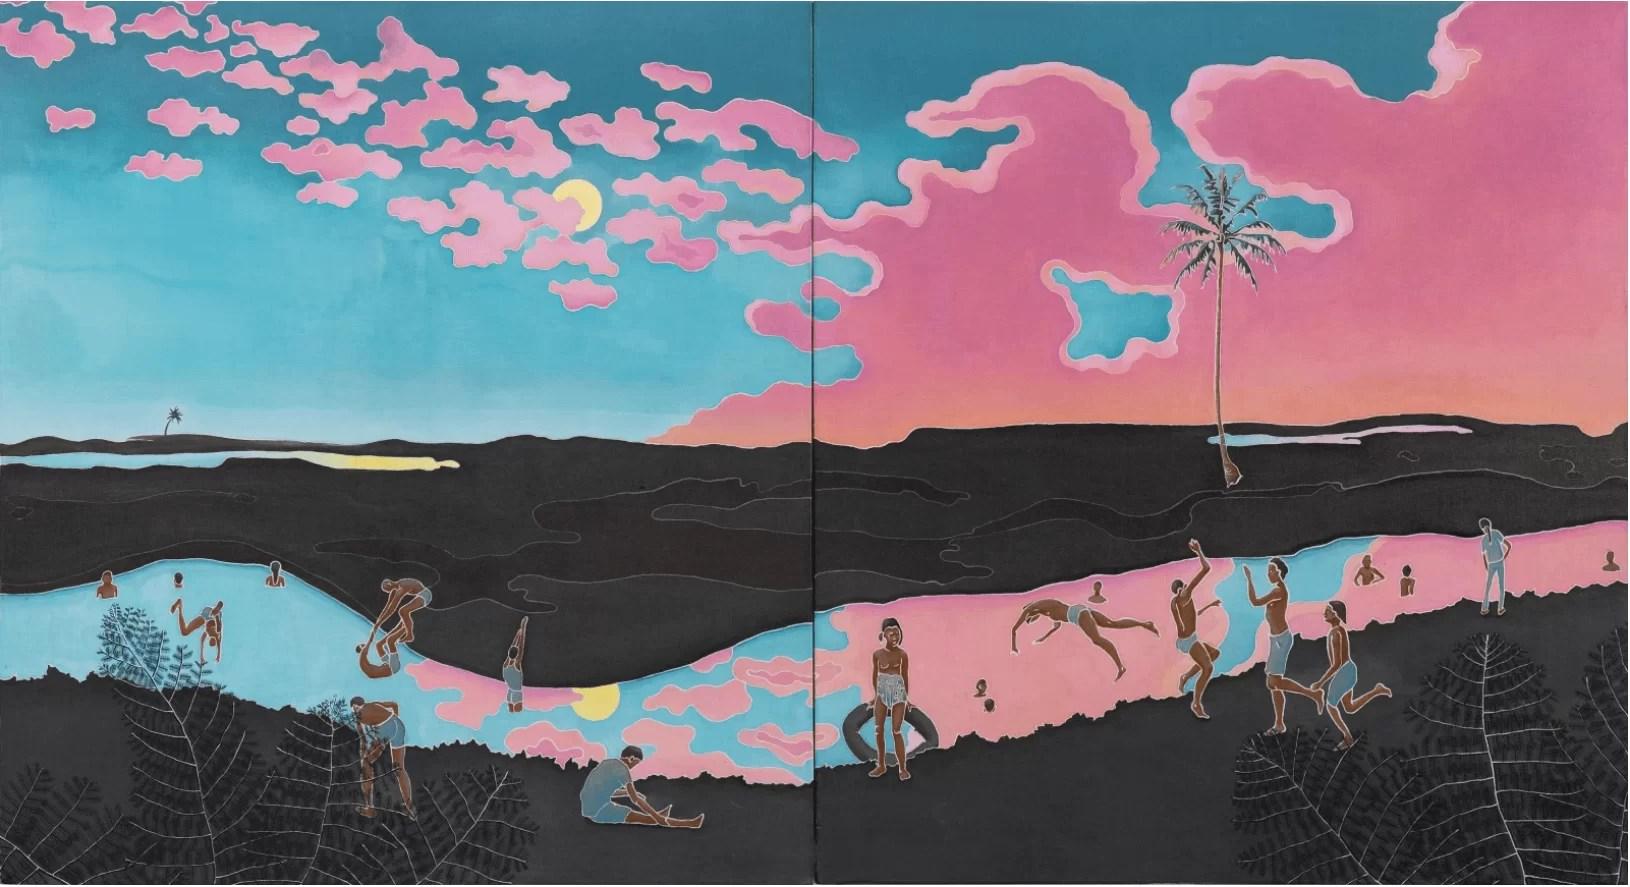 Gazelli Art House Presents Curtain Twitching | Art Plugged